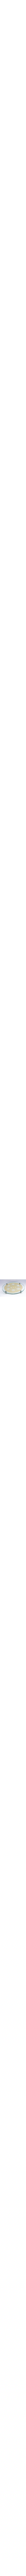 High-quality glass seder plate